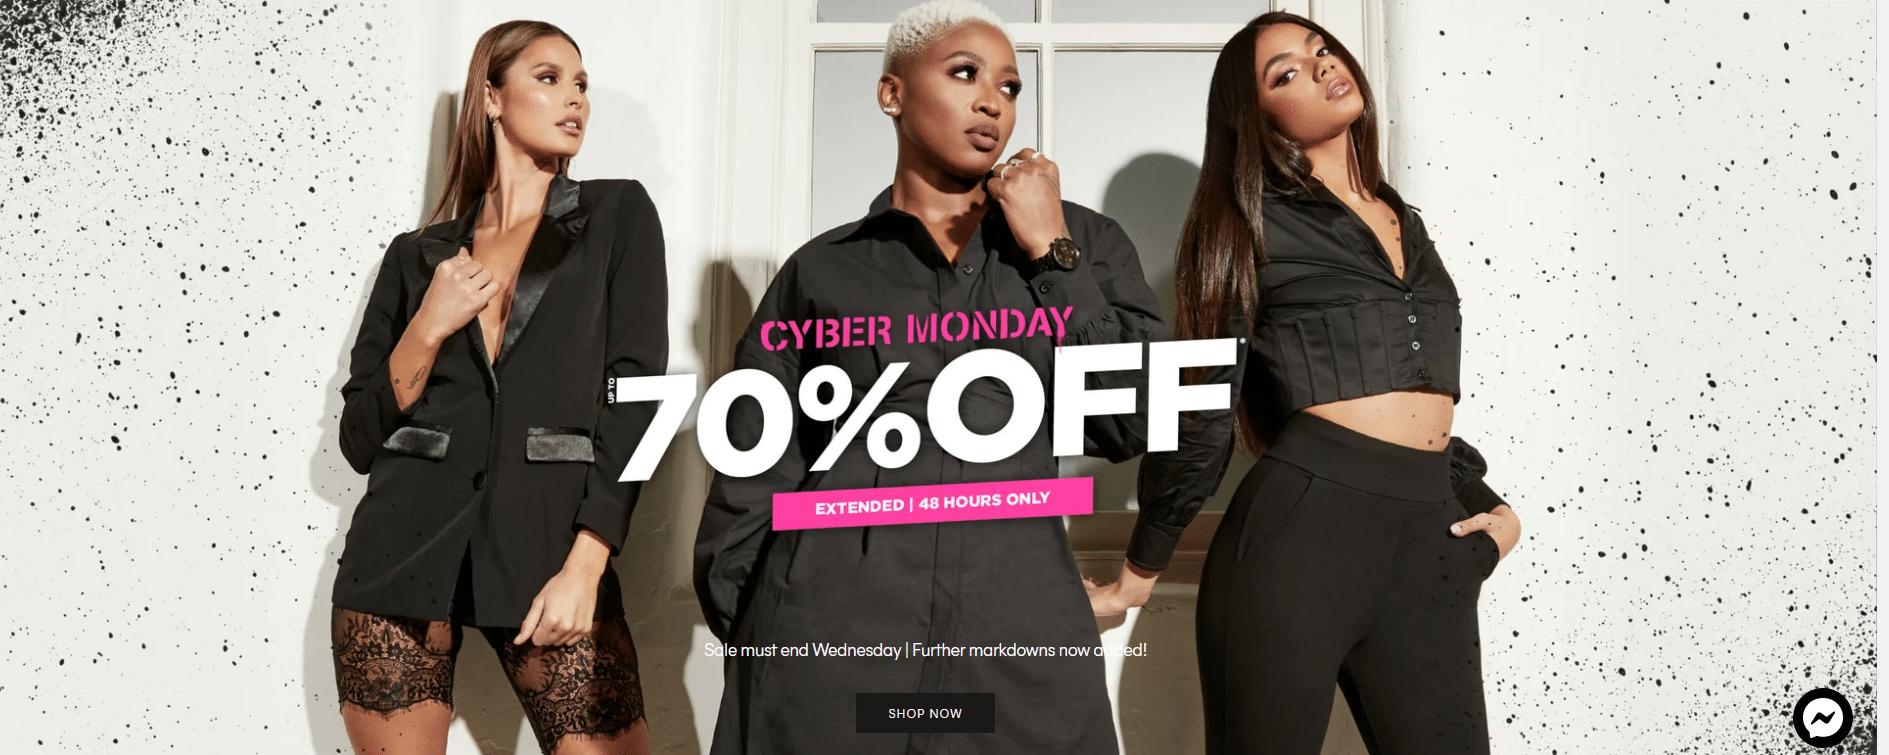 meshki.us 70% off discount